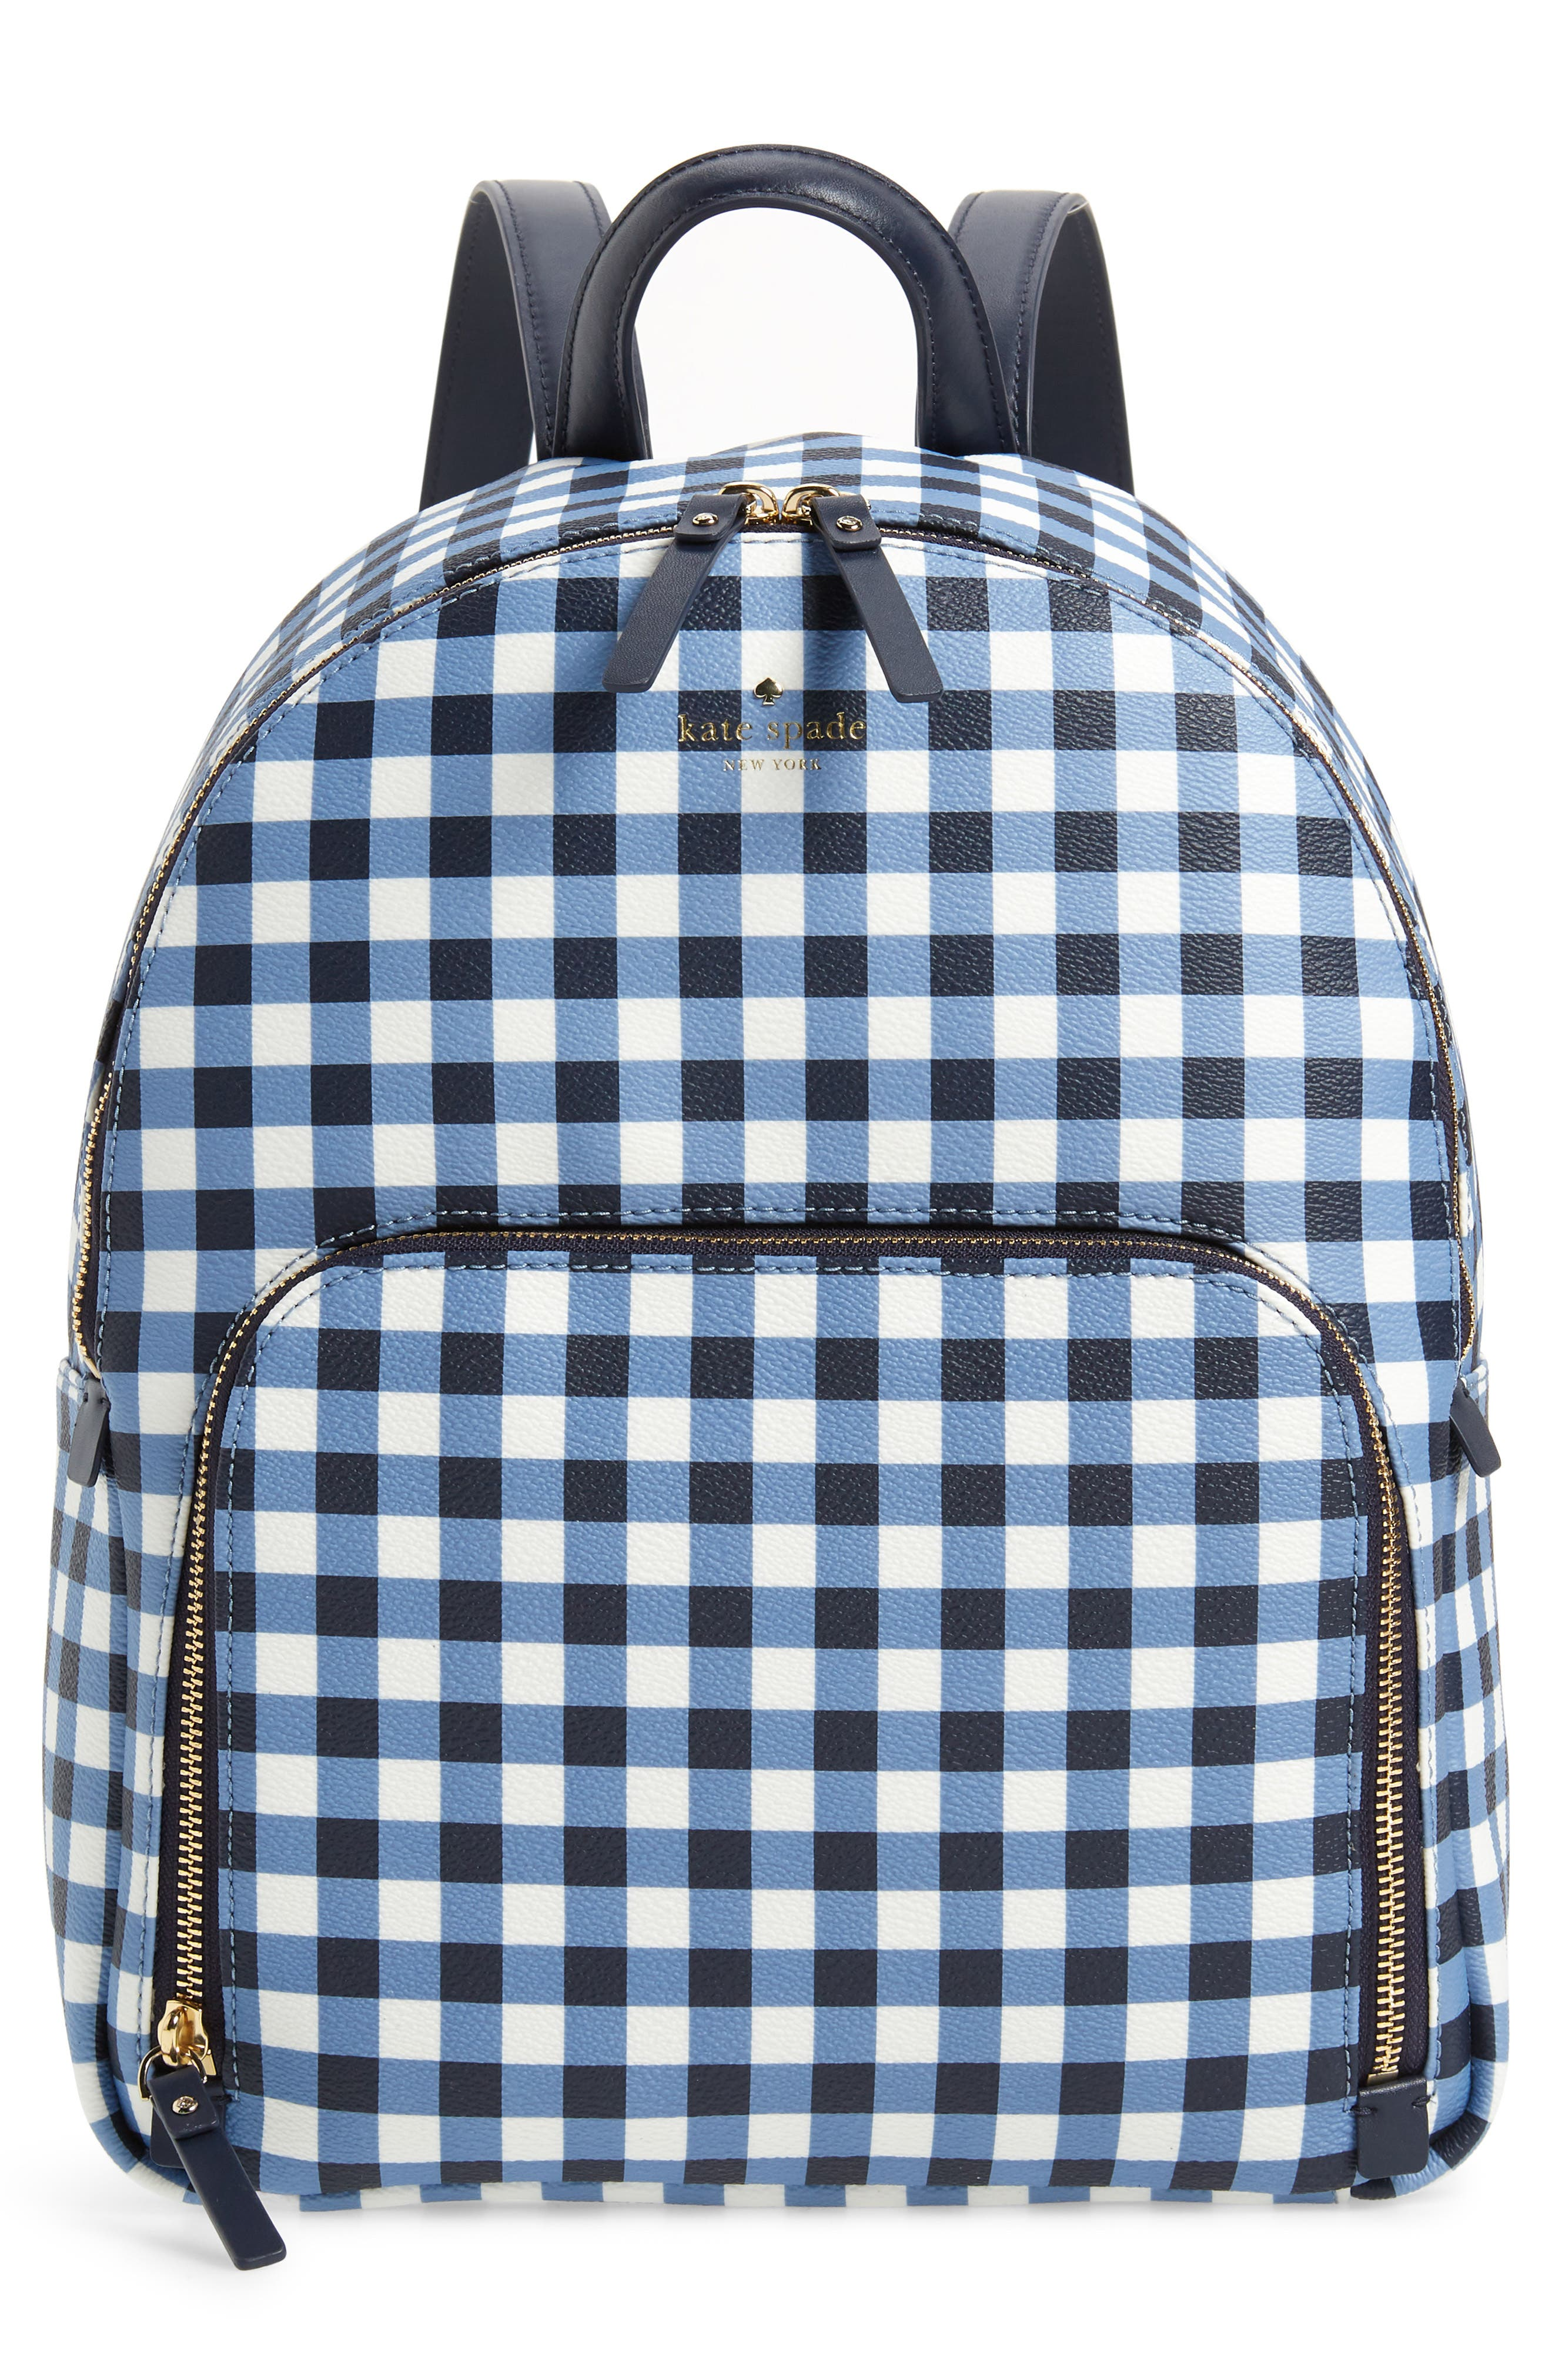 hyde lane hartley gingham backpack,                             Main thumbnail 1, color,                             400